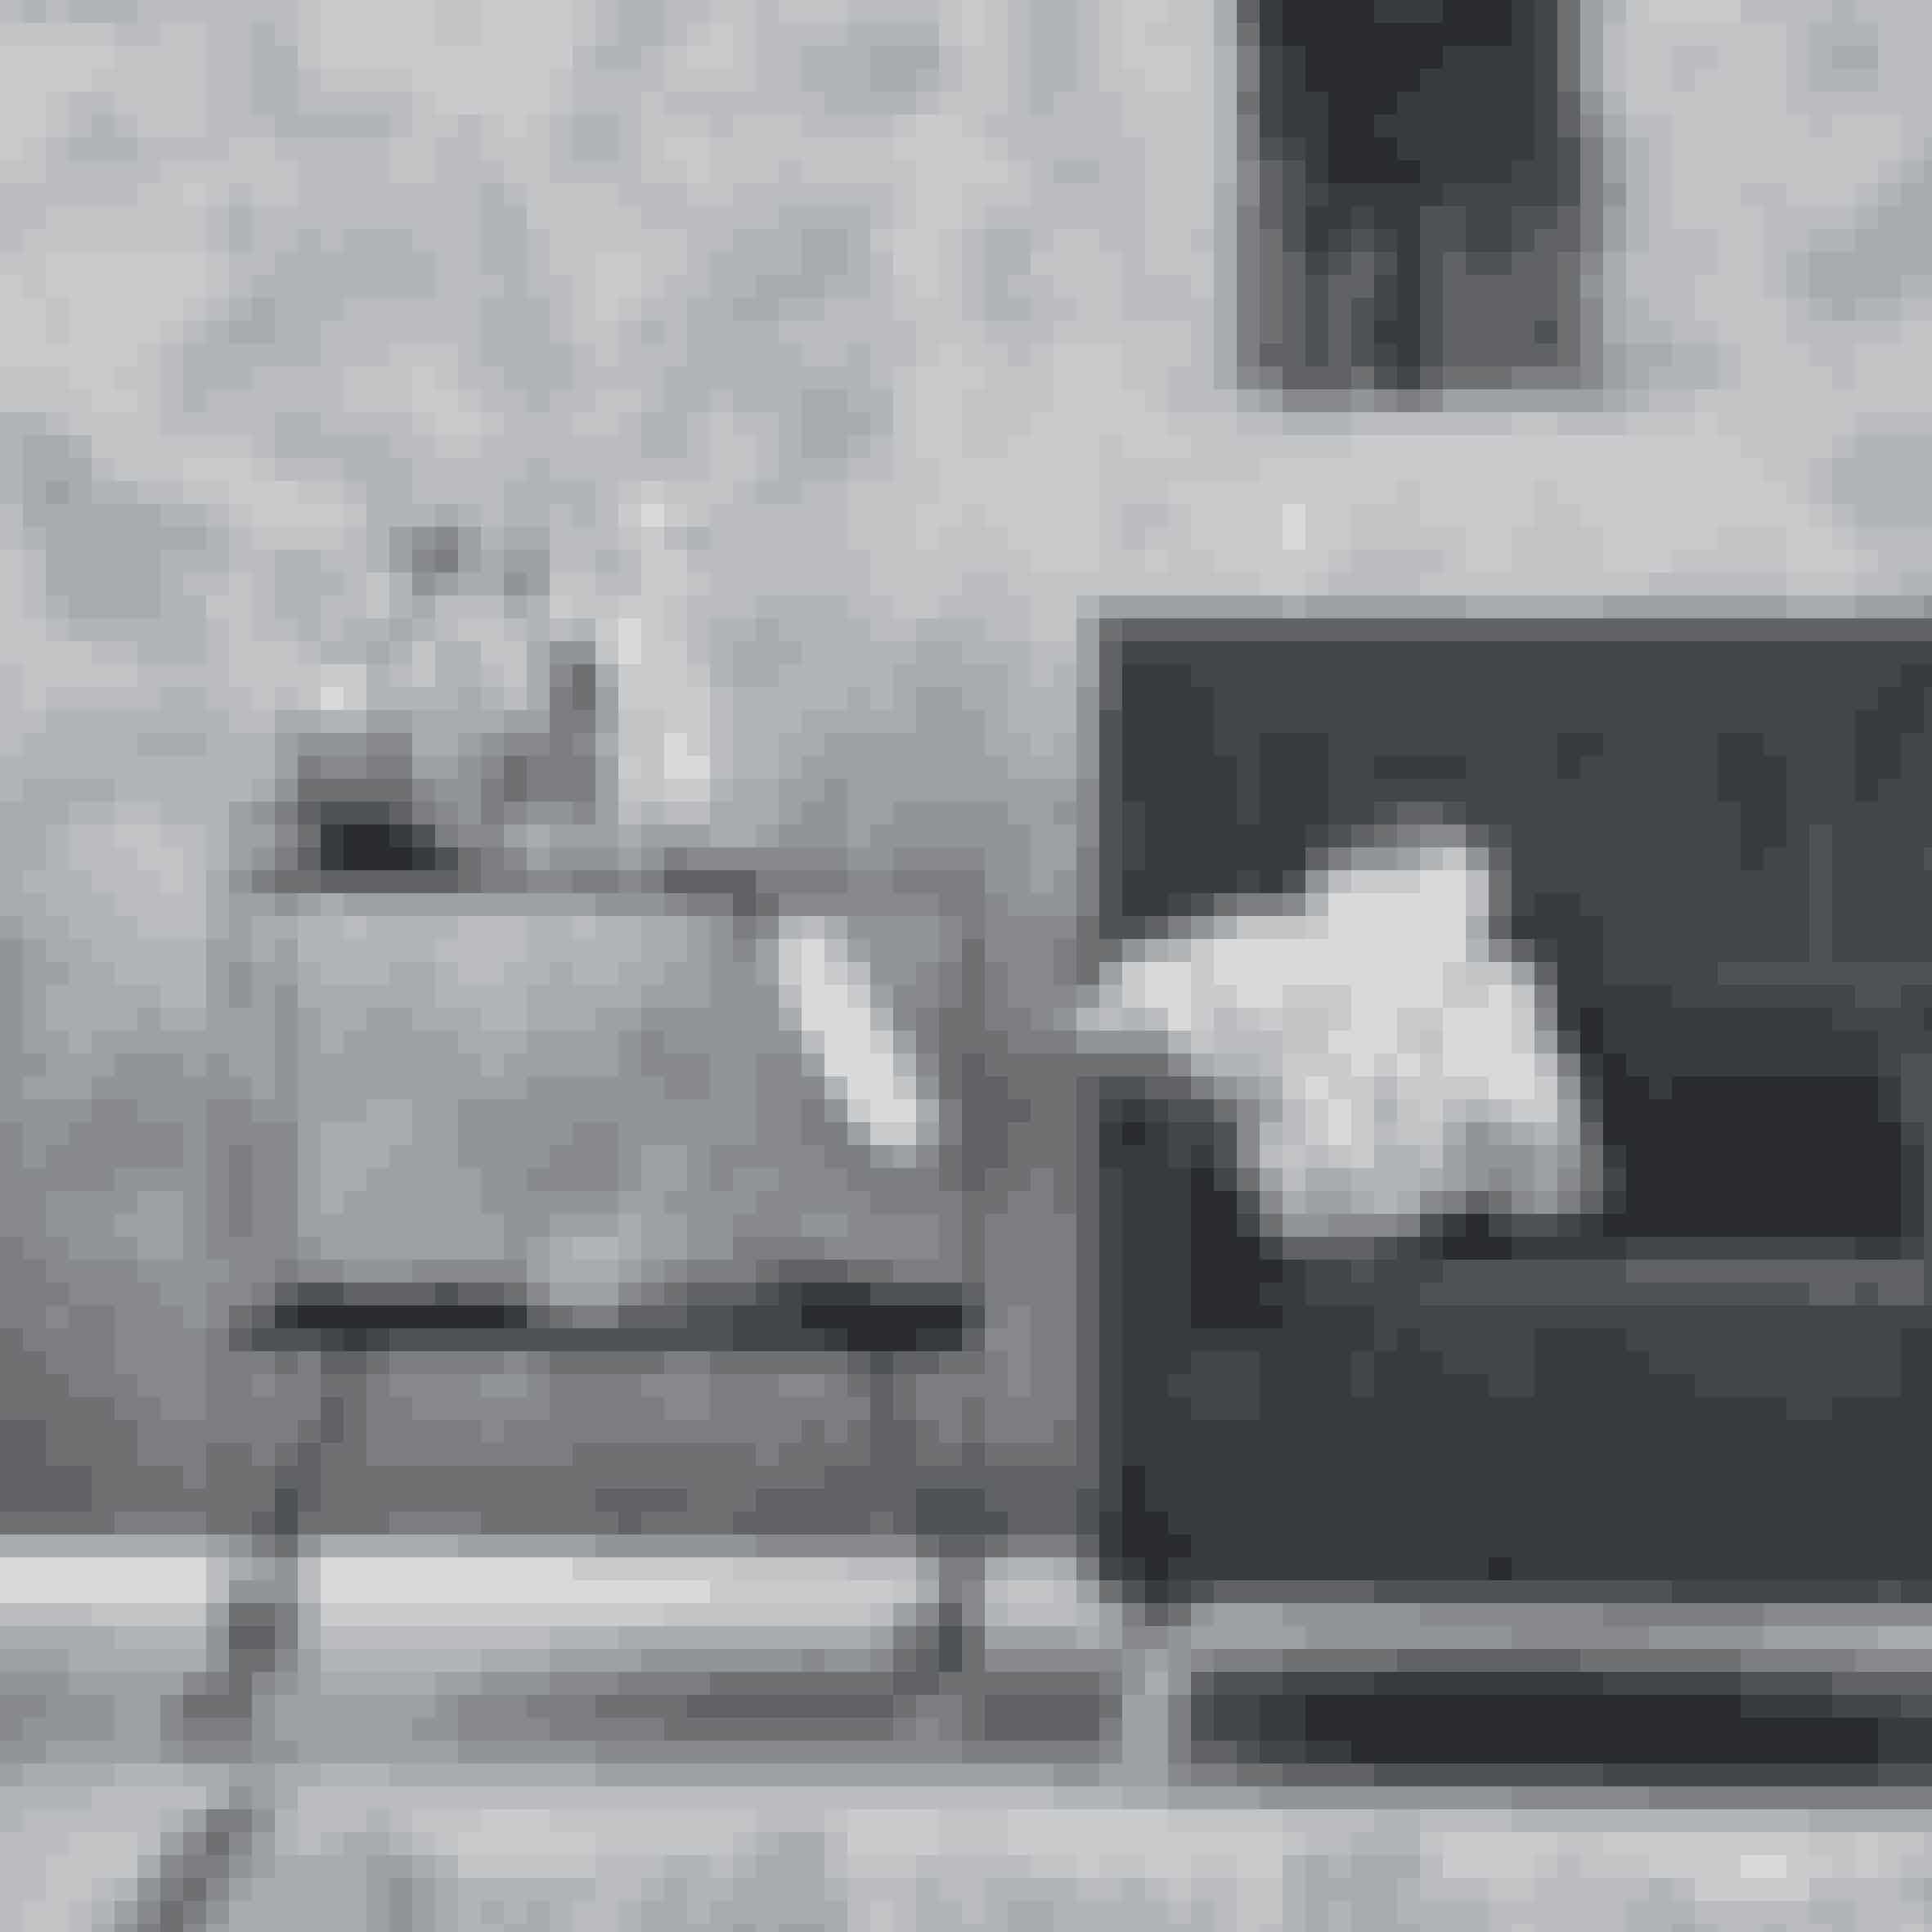 Rullebord i sort stål, h 81 x b 65 x d 40 cm, 1.950 kr. Gulvtæppe, 60 x 90 cm, 220 kr. Vægdekoration, 32 x 60 cm, 460 kr. House Doctor.